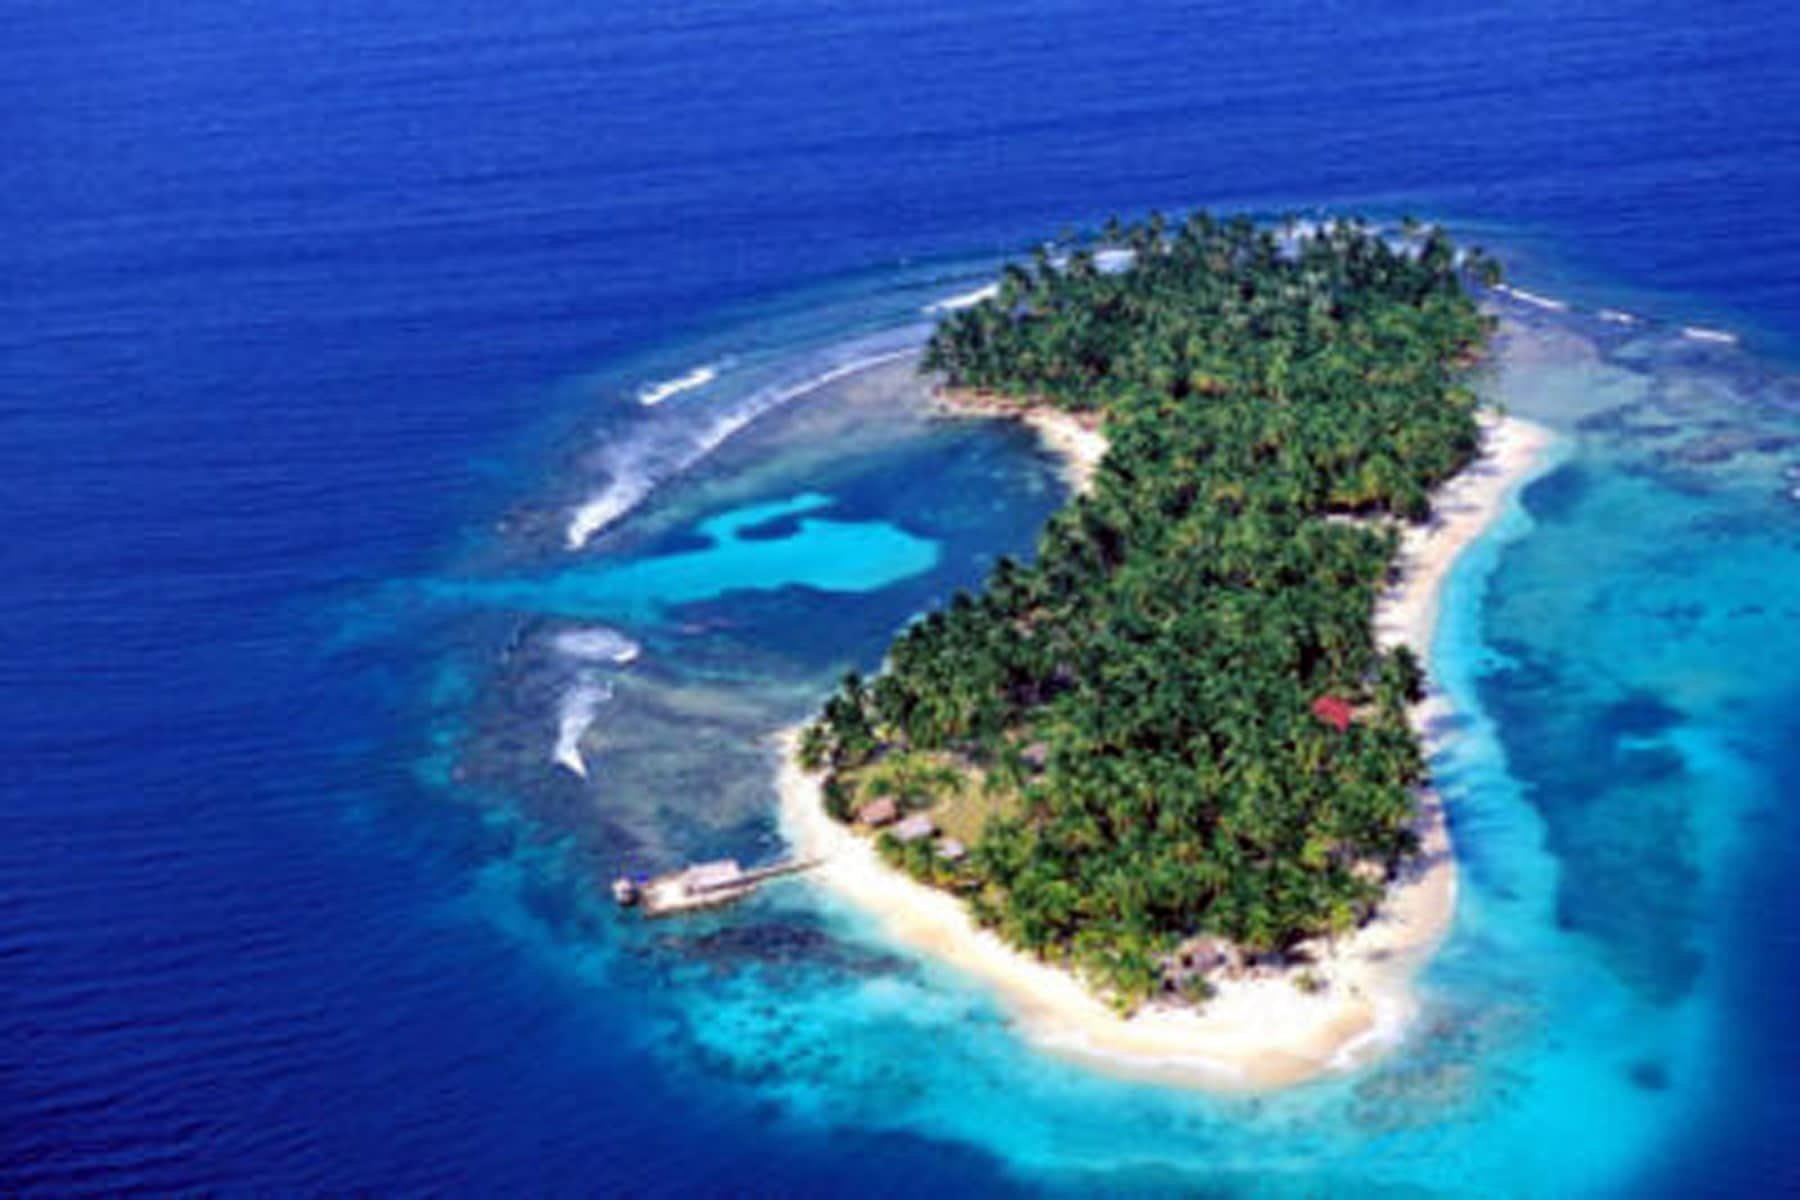 Vista aérea de la isla Narasgandub Bibbi